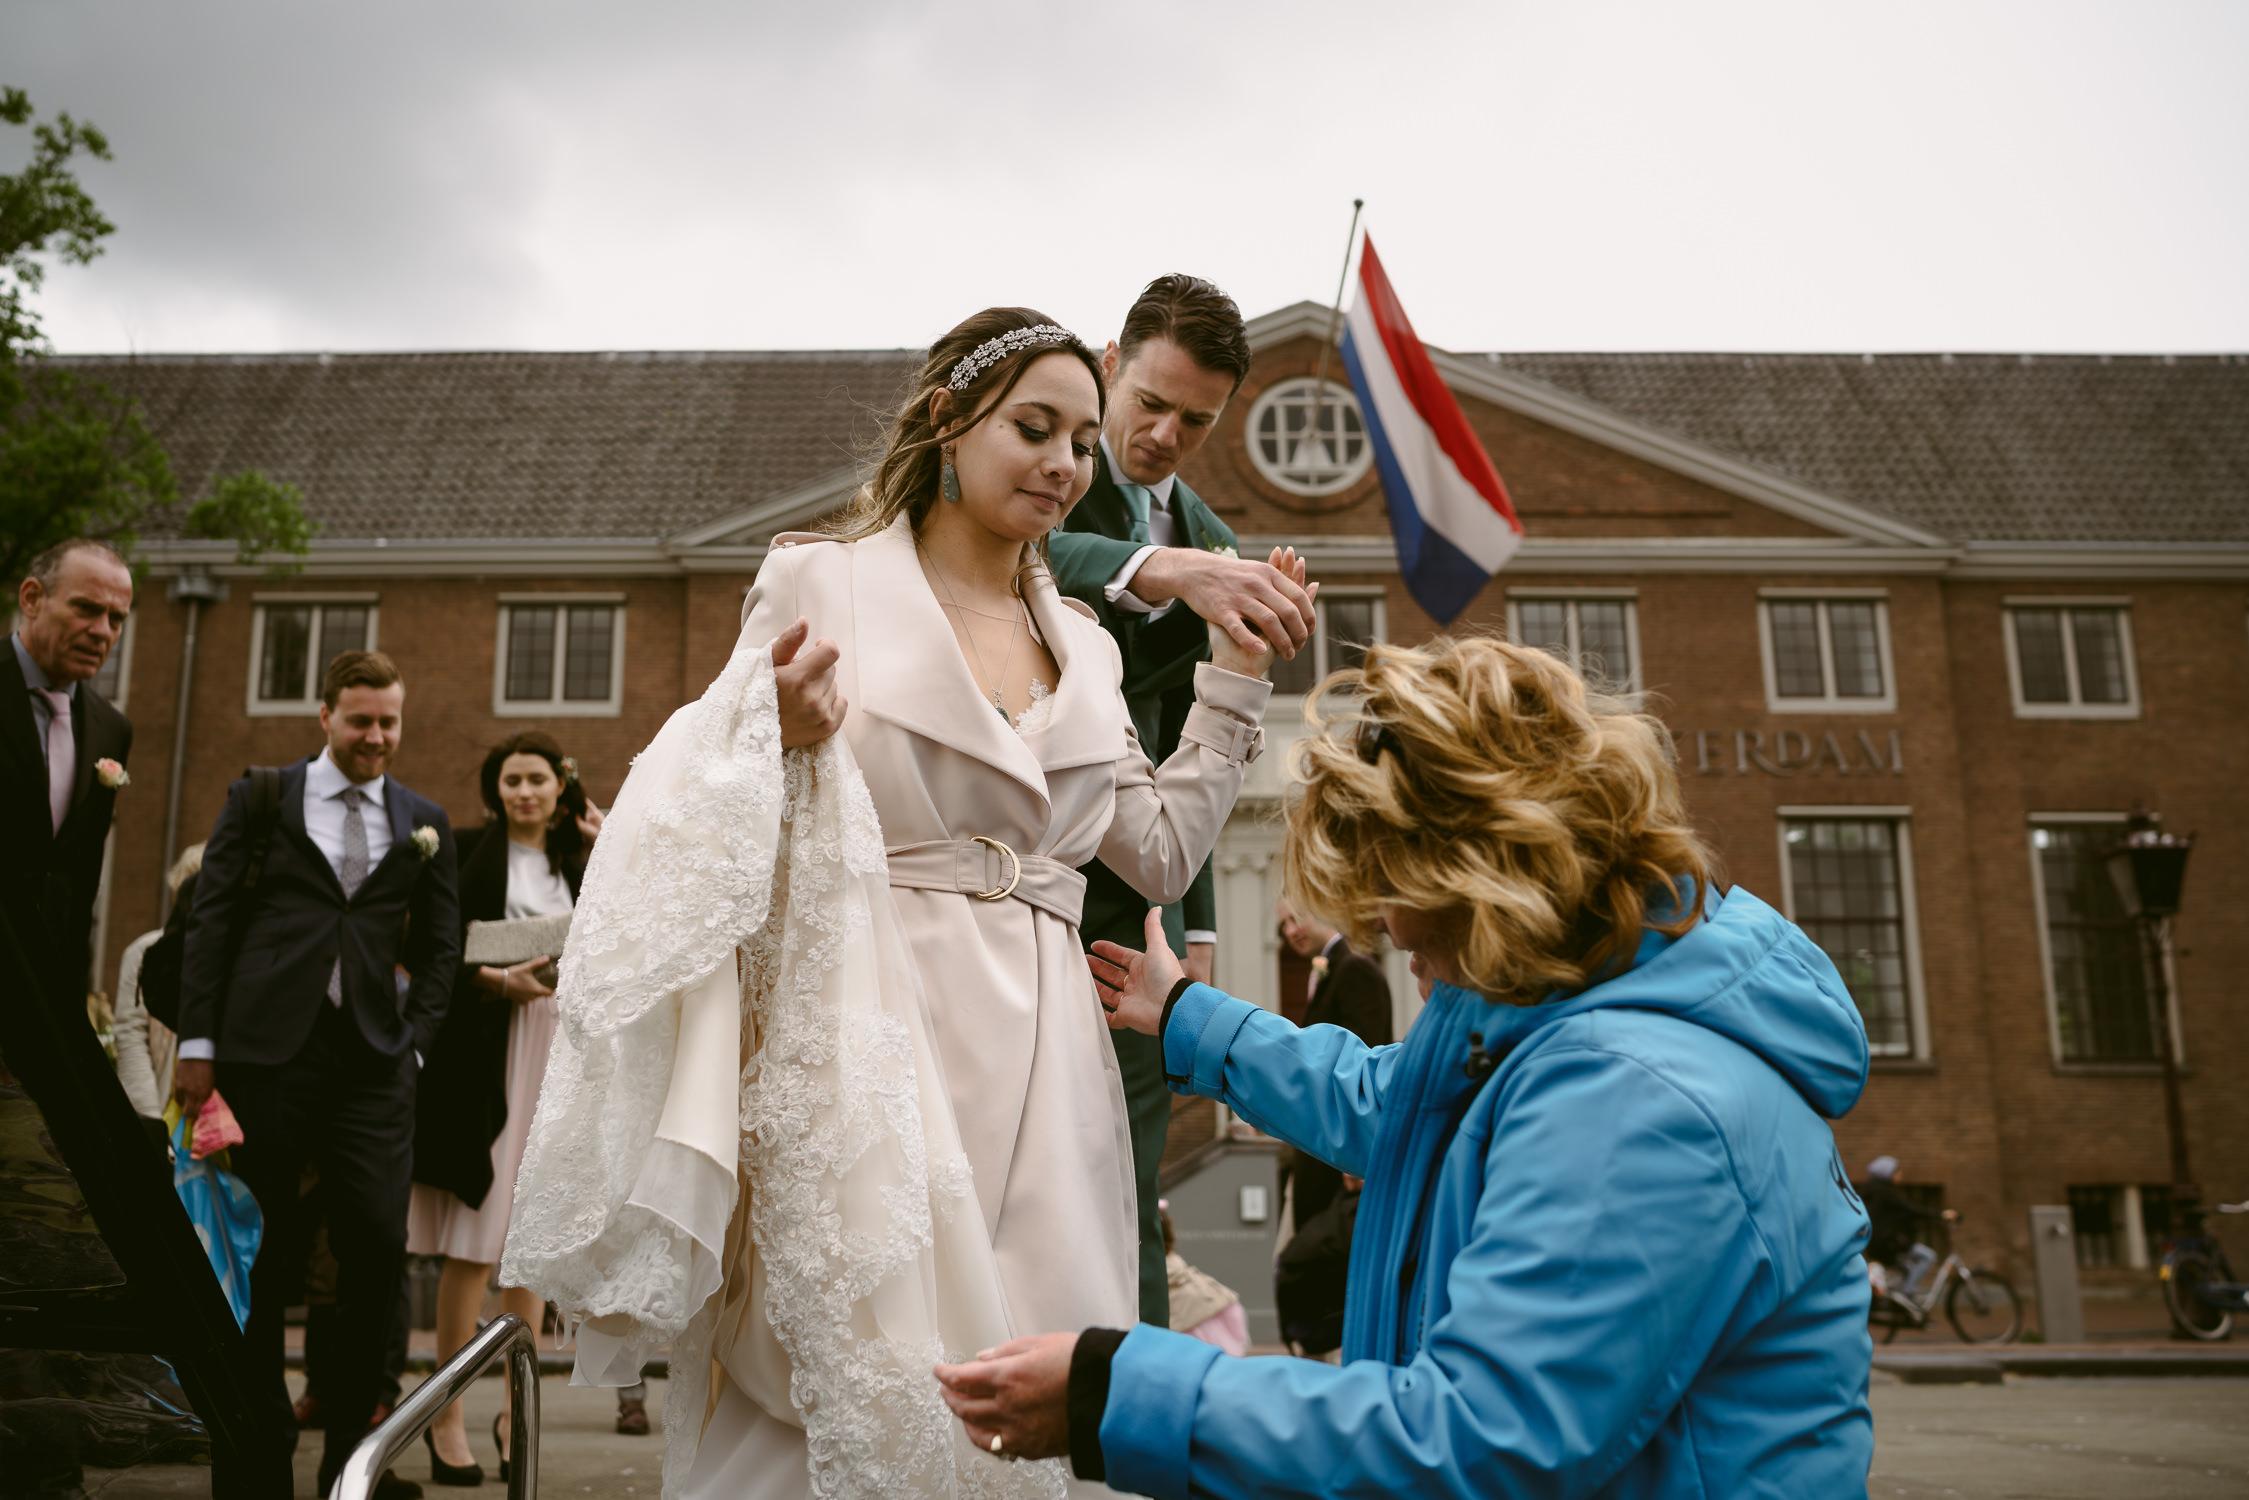 bruidsfotografie-amsterdam-utrecht-trouwfotograaf-mark-hadden-wedding-photography-Robin & Guus-115.jpg